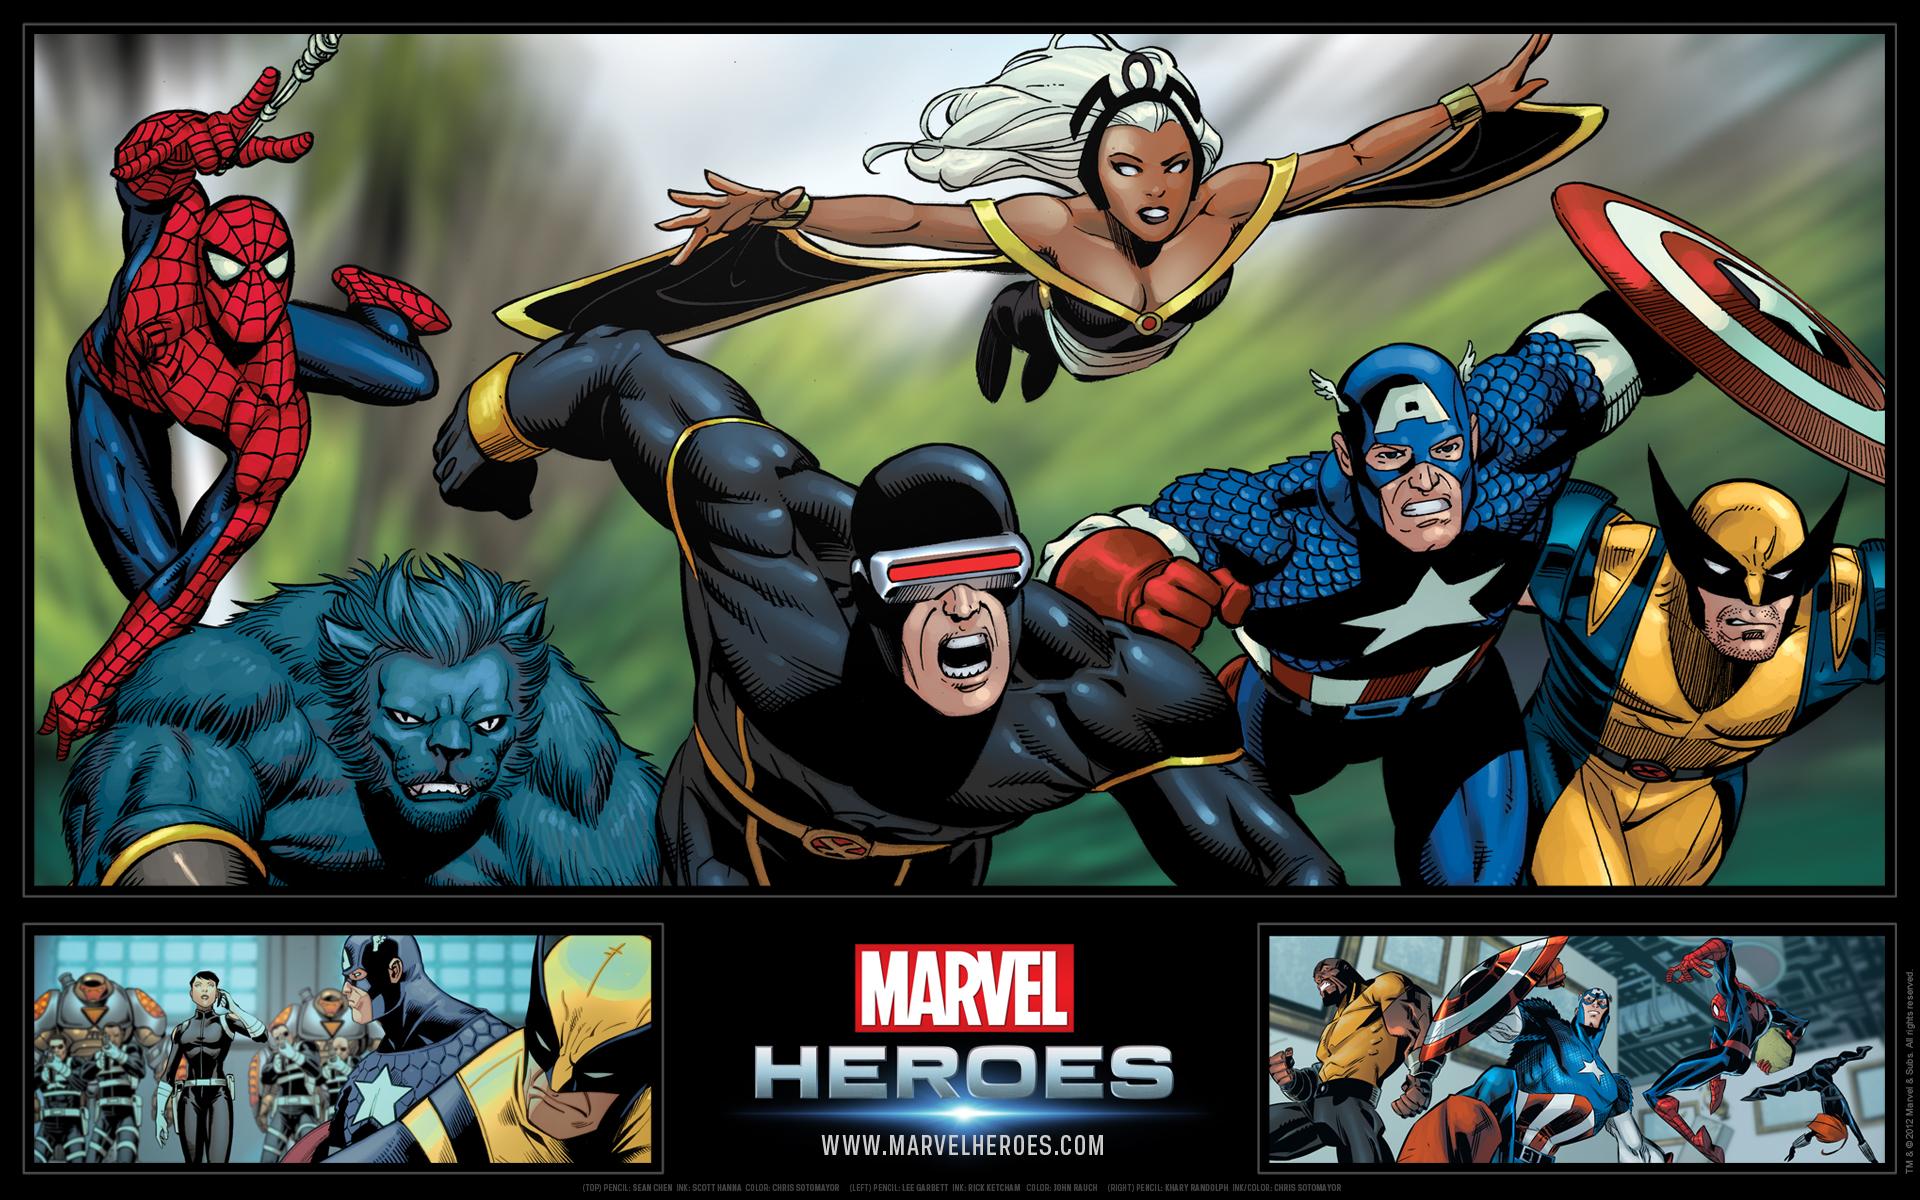 Marvel Heroes Wallpaper 1